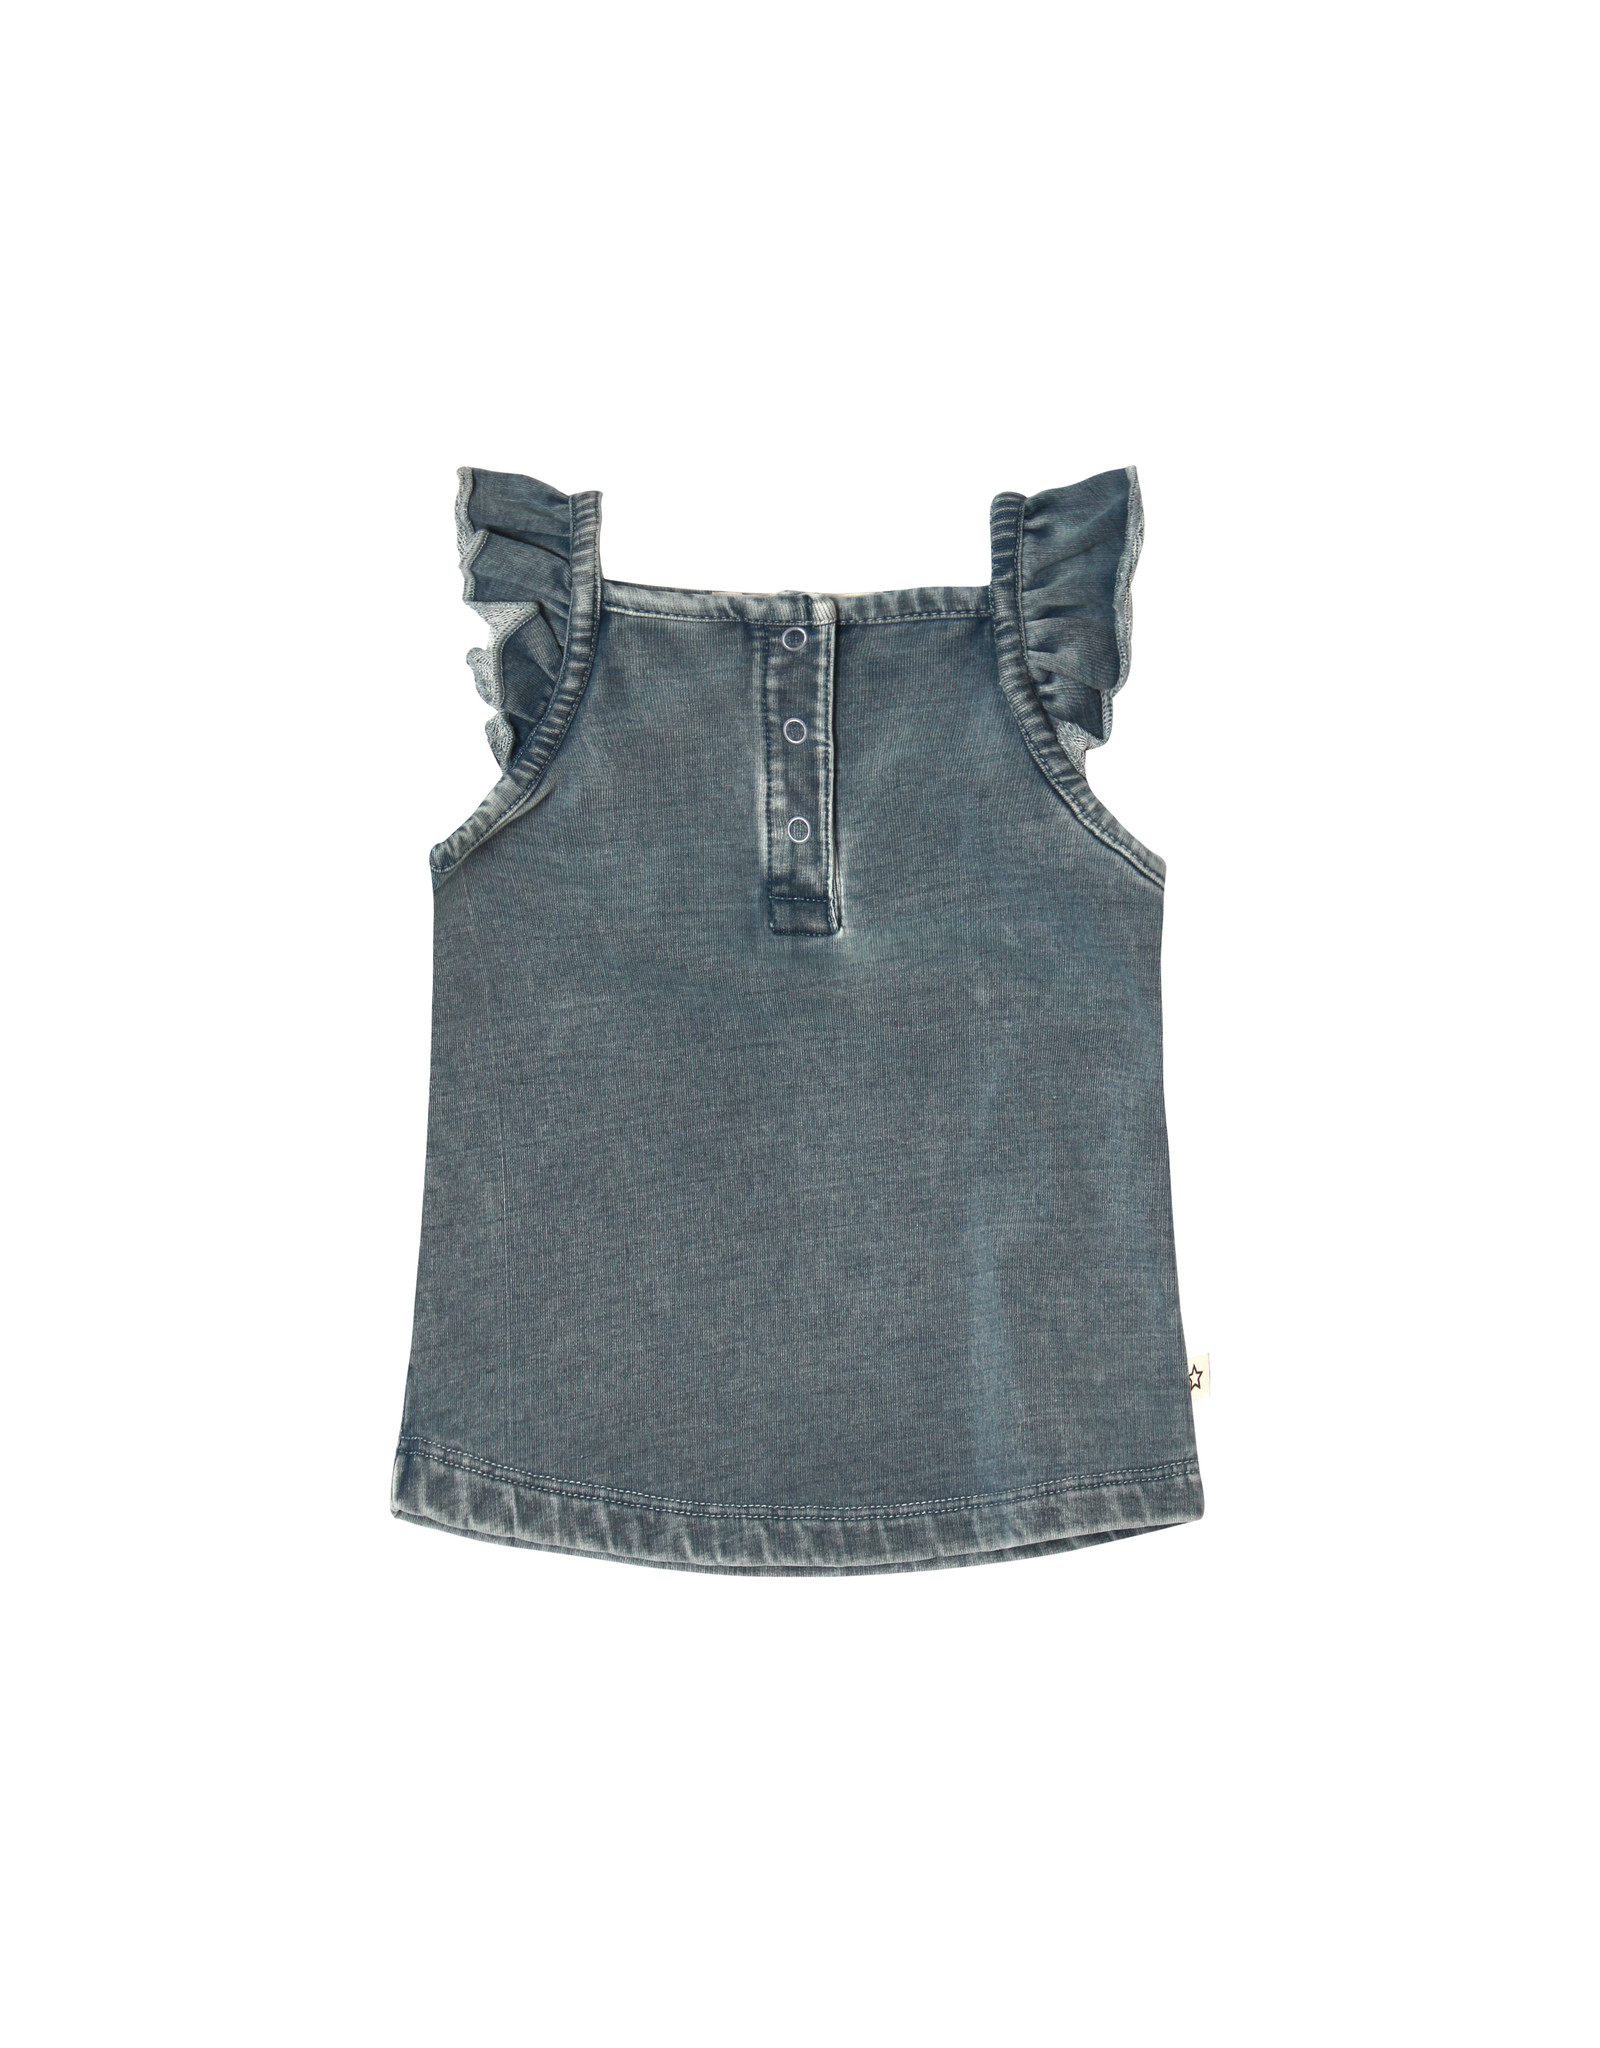 Your Wishes Knitted Denim | Ruffle Singlet Denim Blue